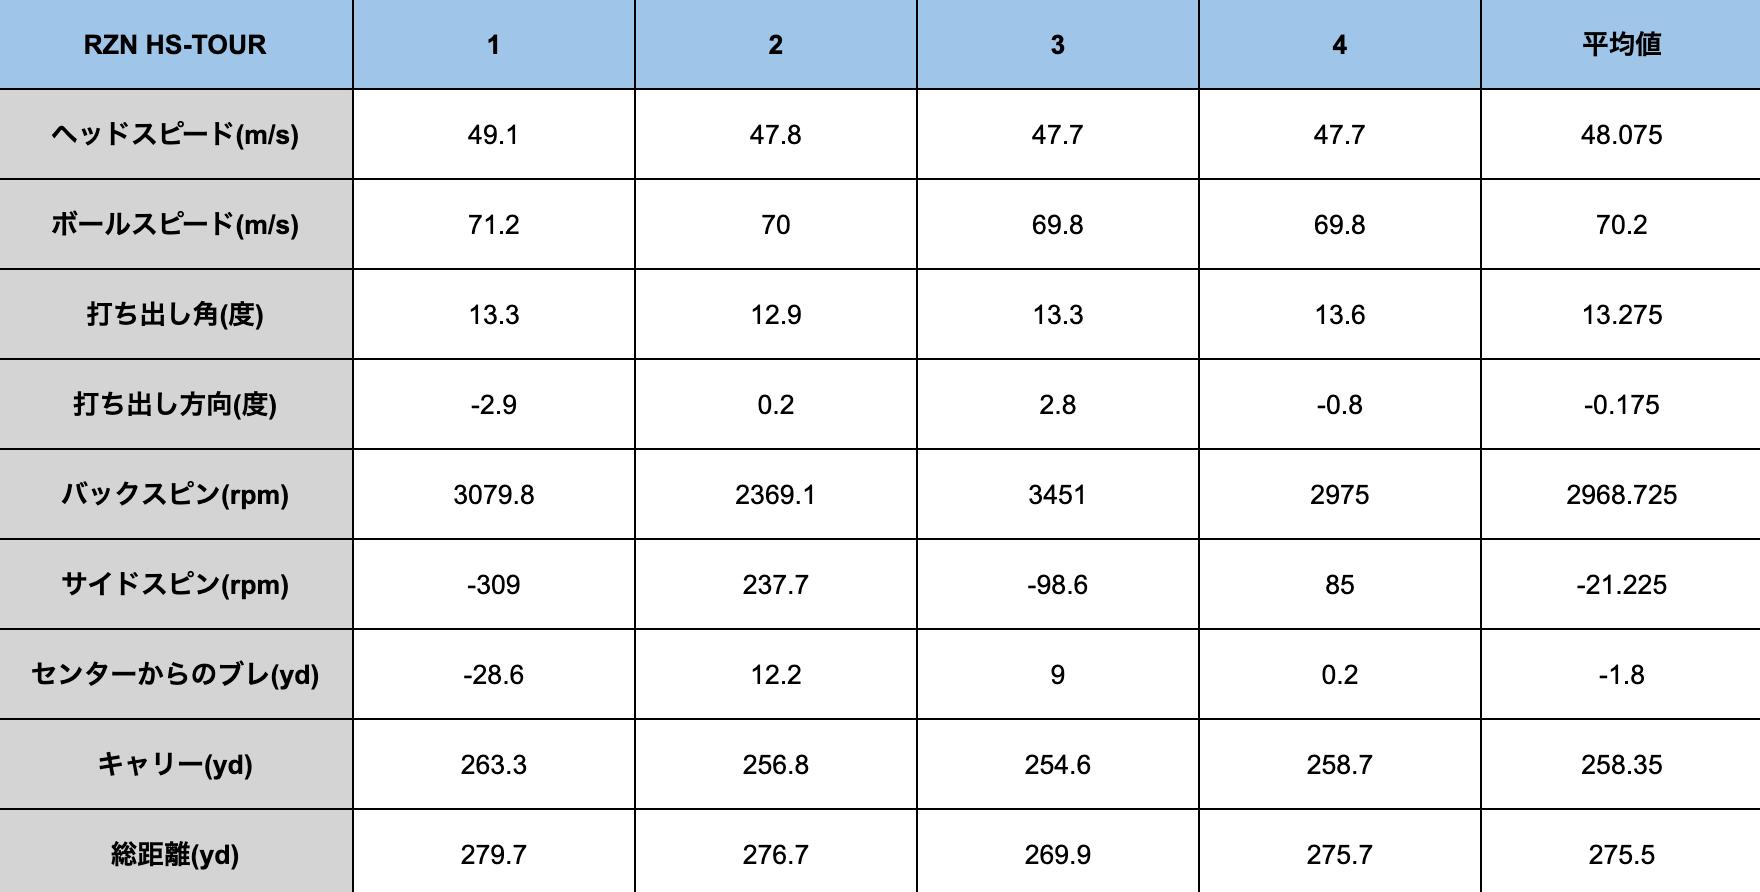 RZN HS-TOUR試打データ